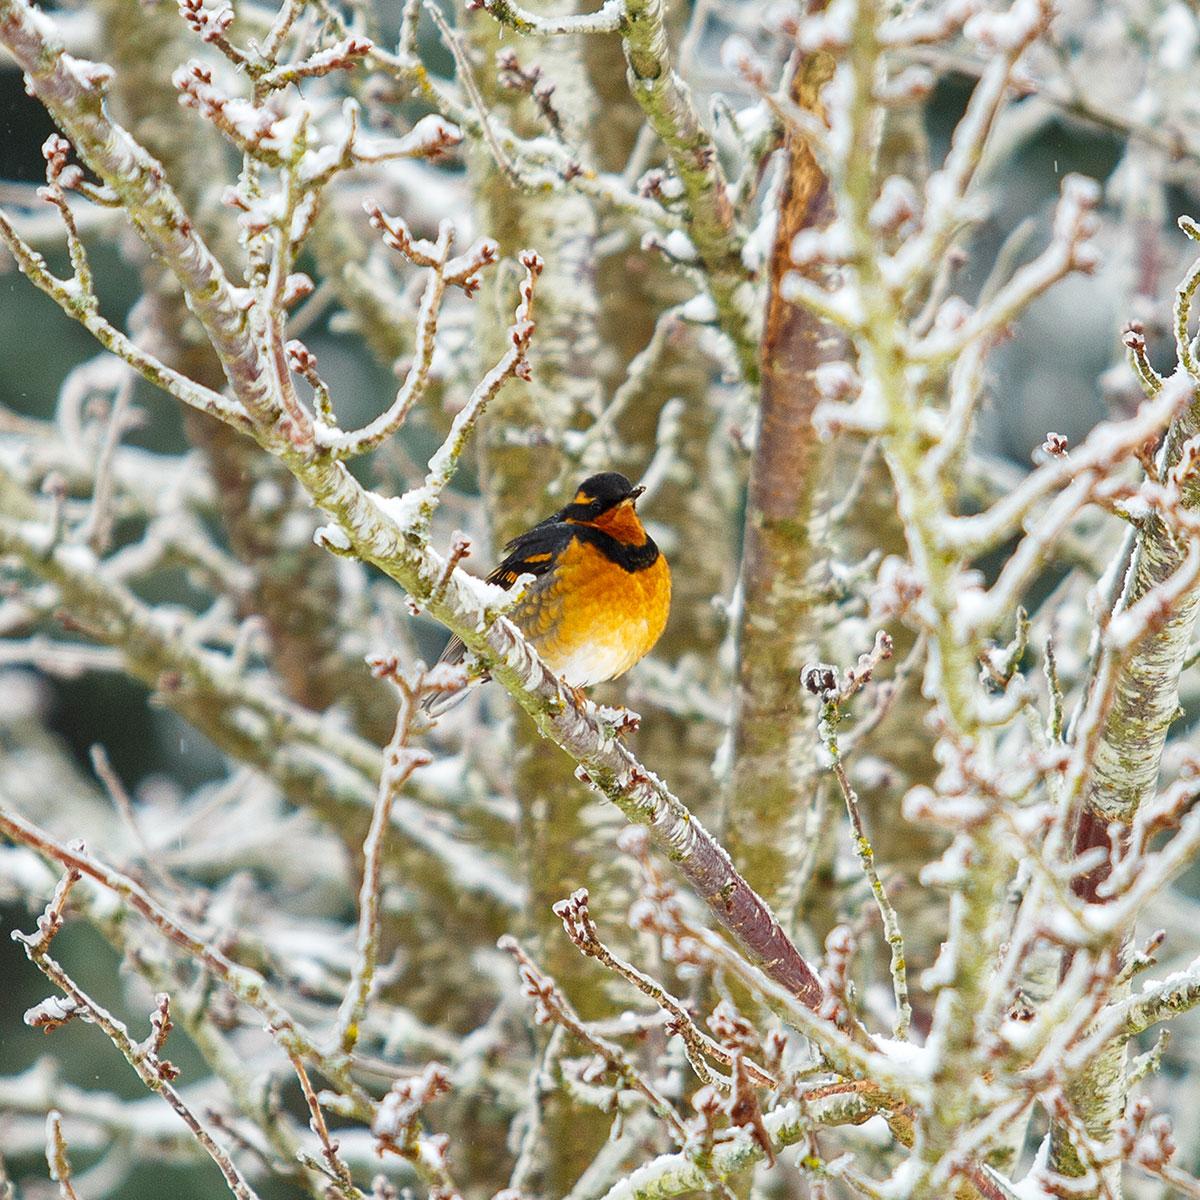 Orange Thrush in winter